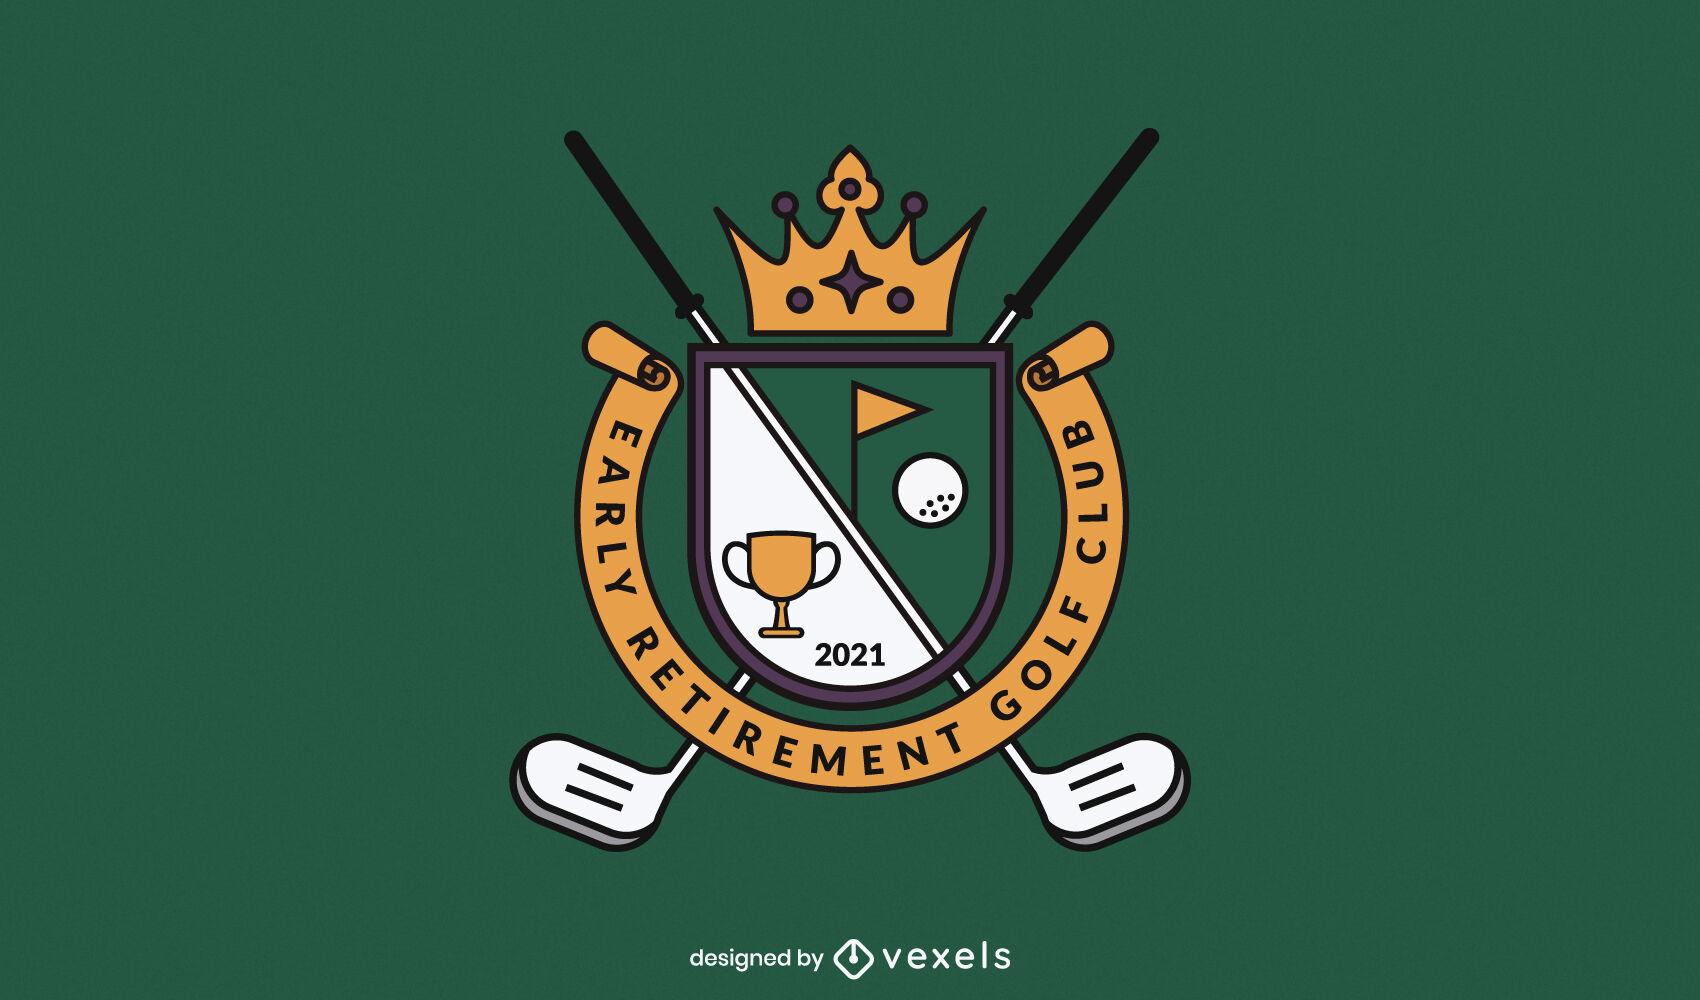 Design de logotipo comercial de equipamentos esportivos de golfe